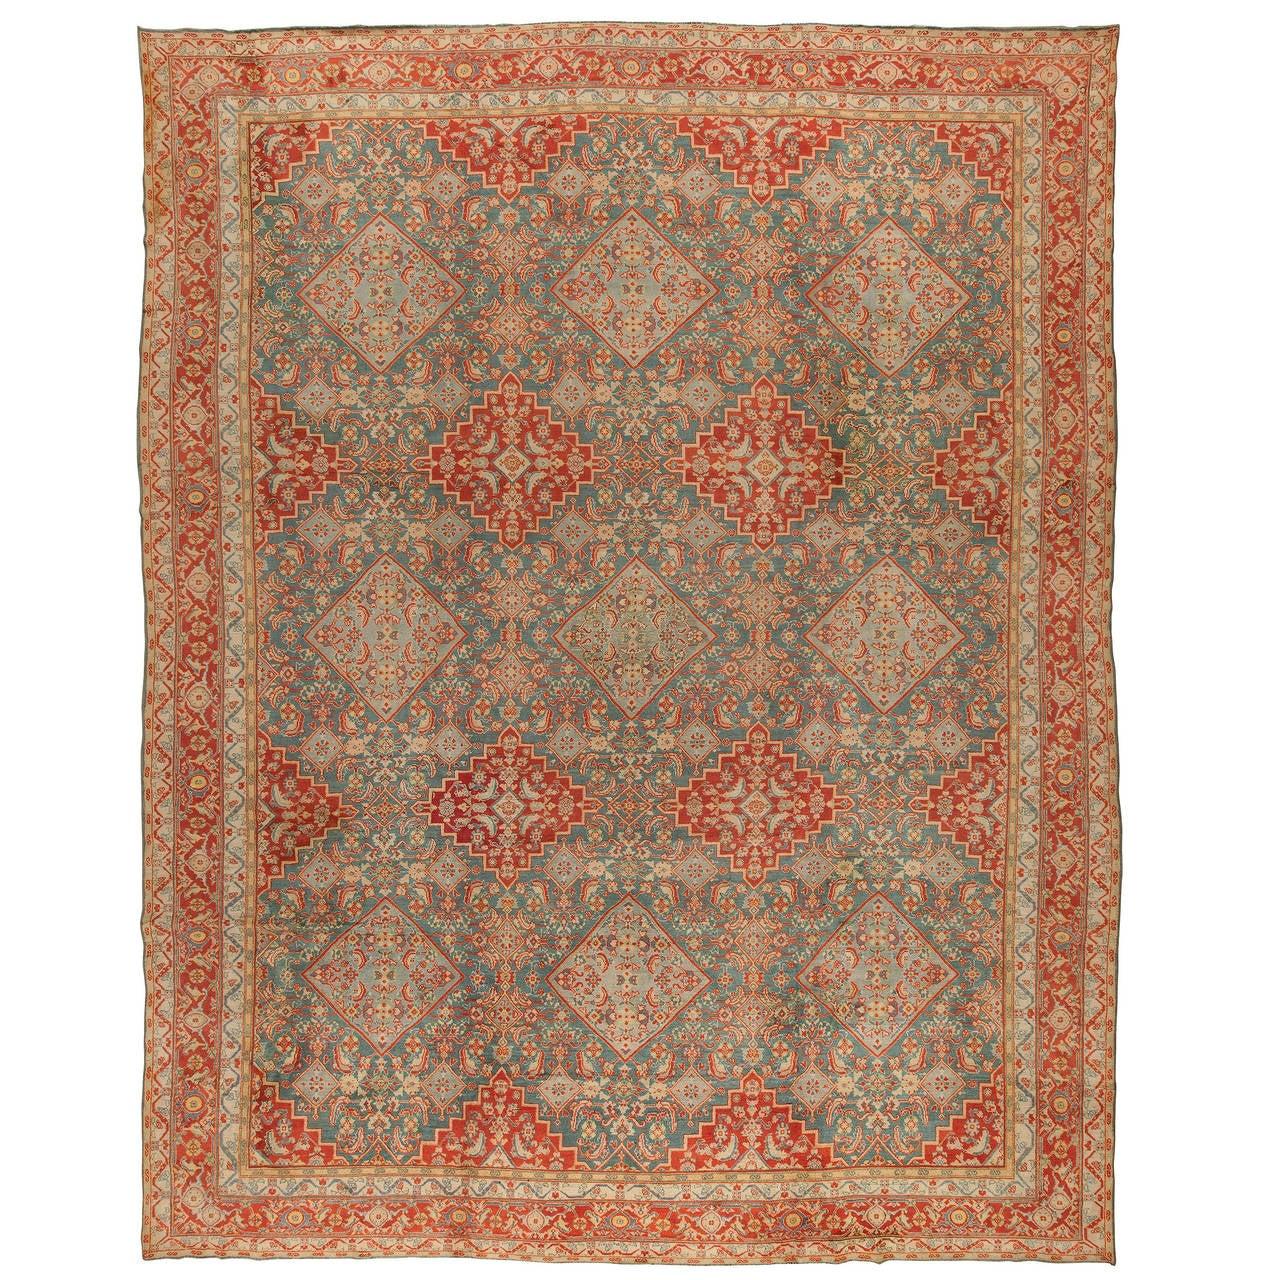 Antique Cotton Indian Agra Rug